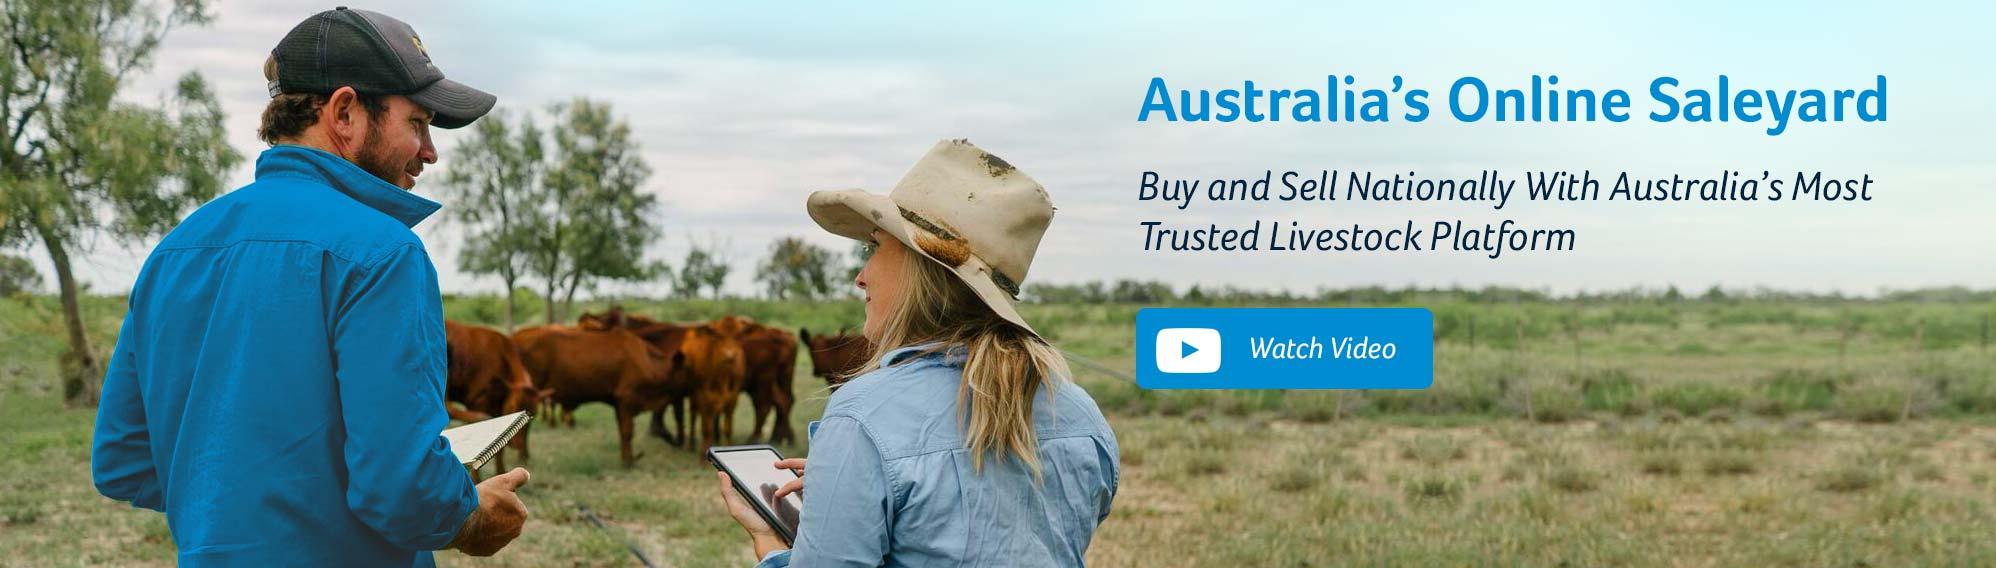 Australias Online Saleyard